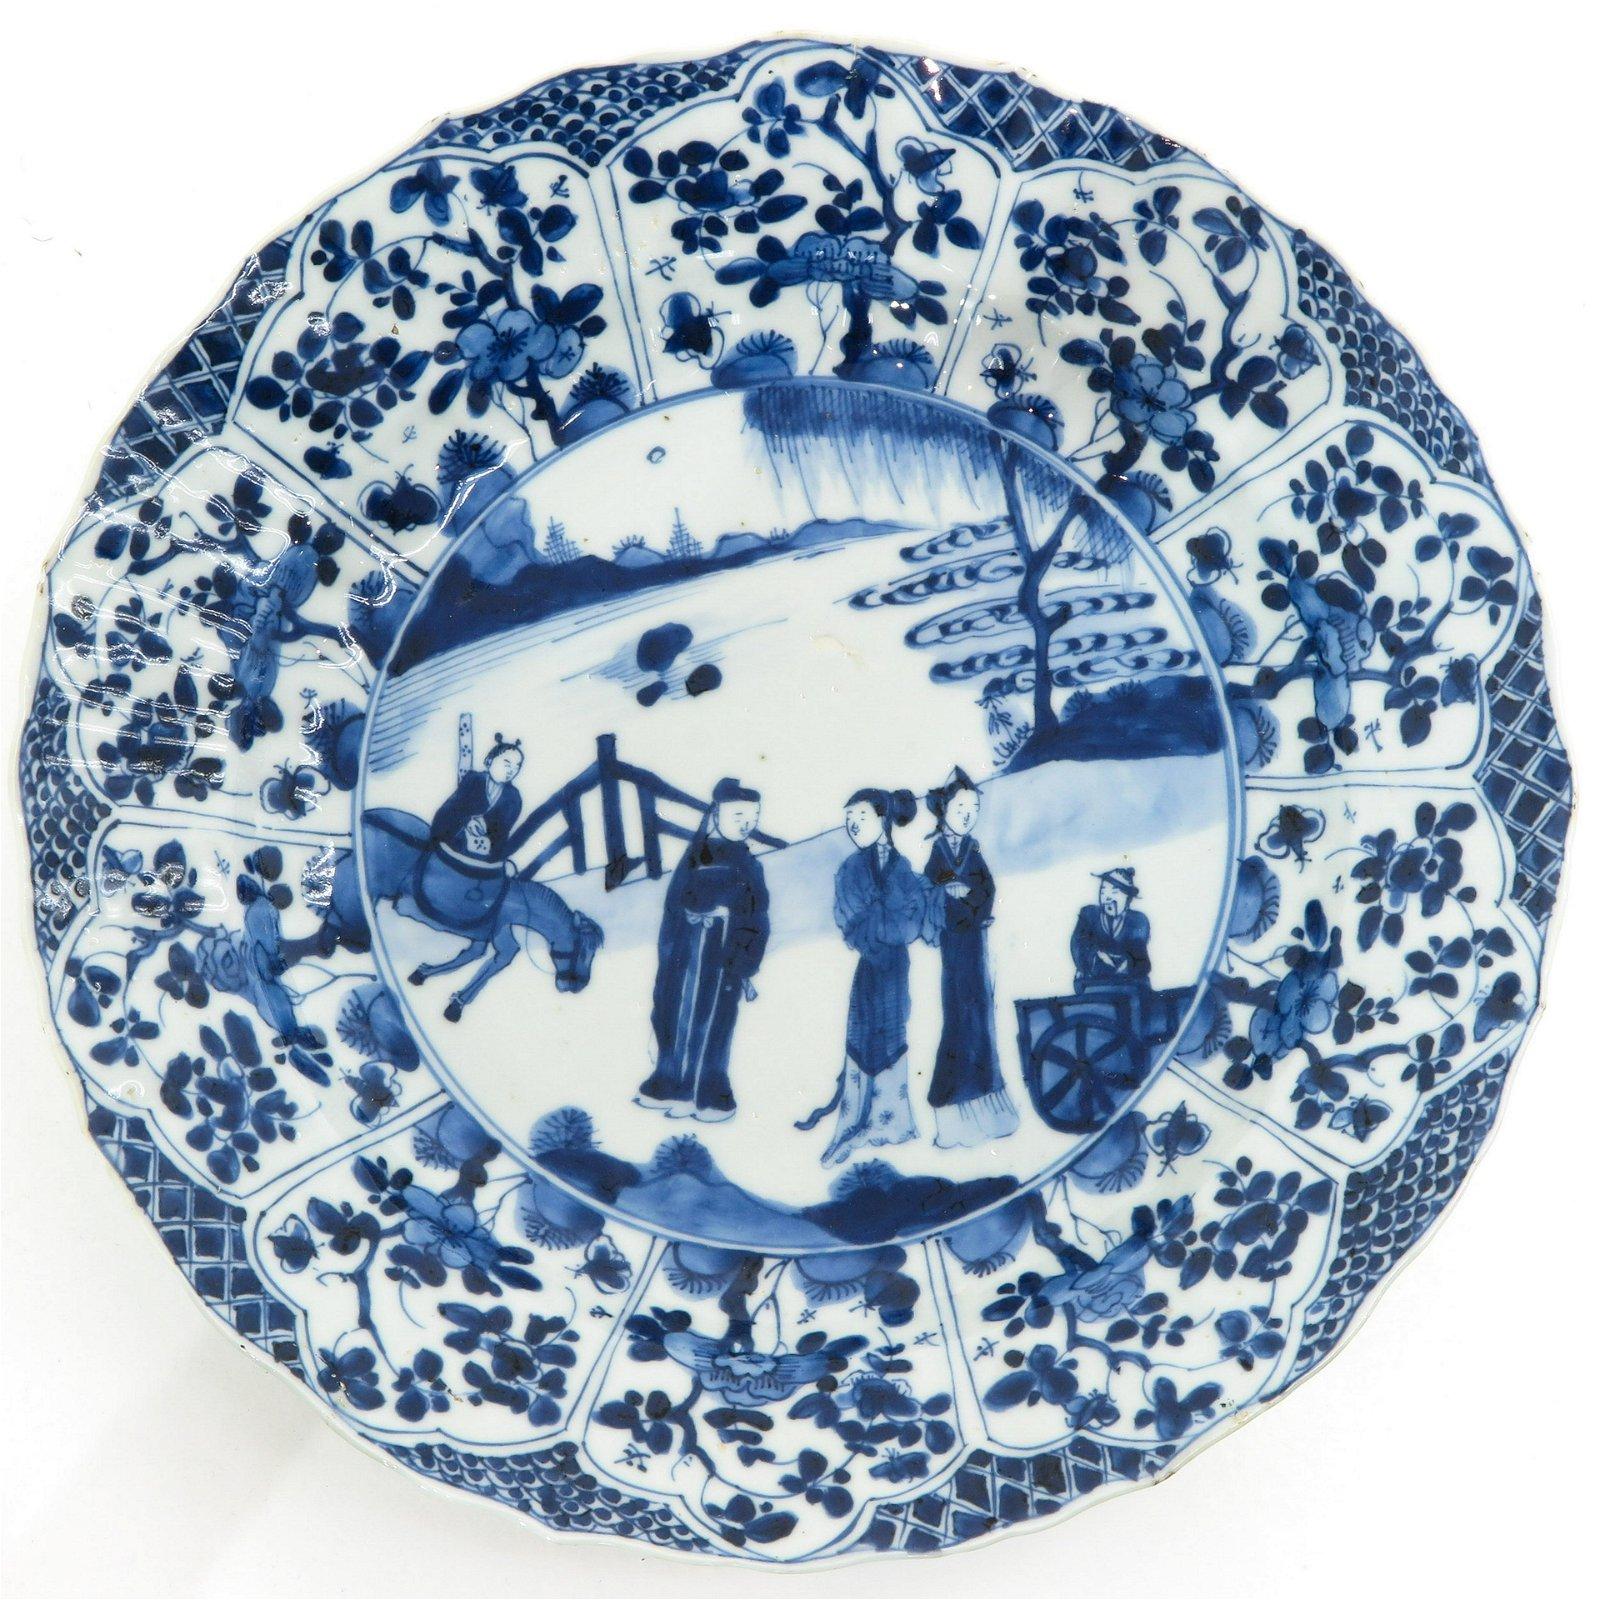 A Blue and White Decor Dish